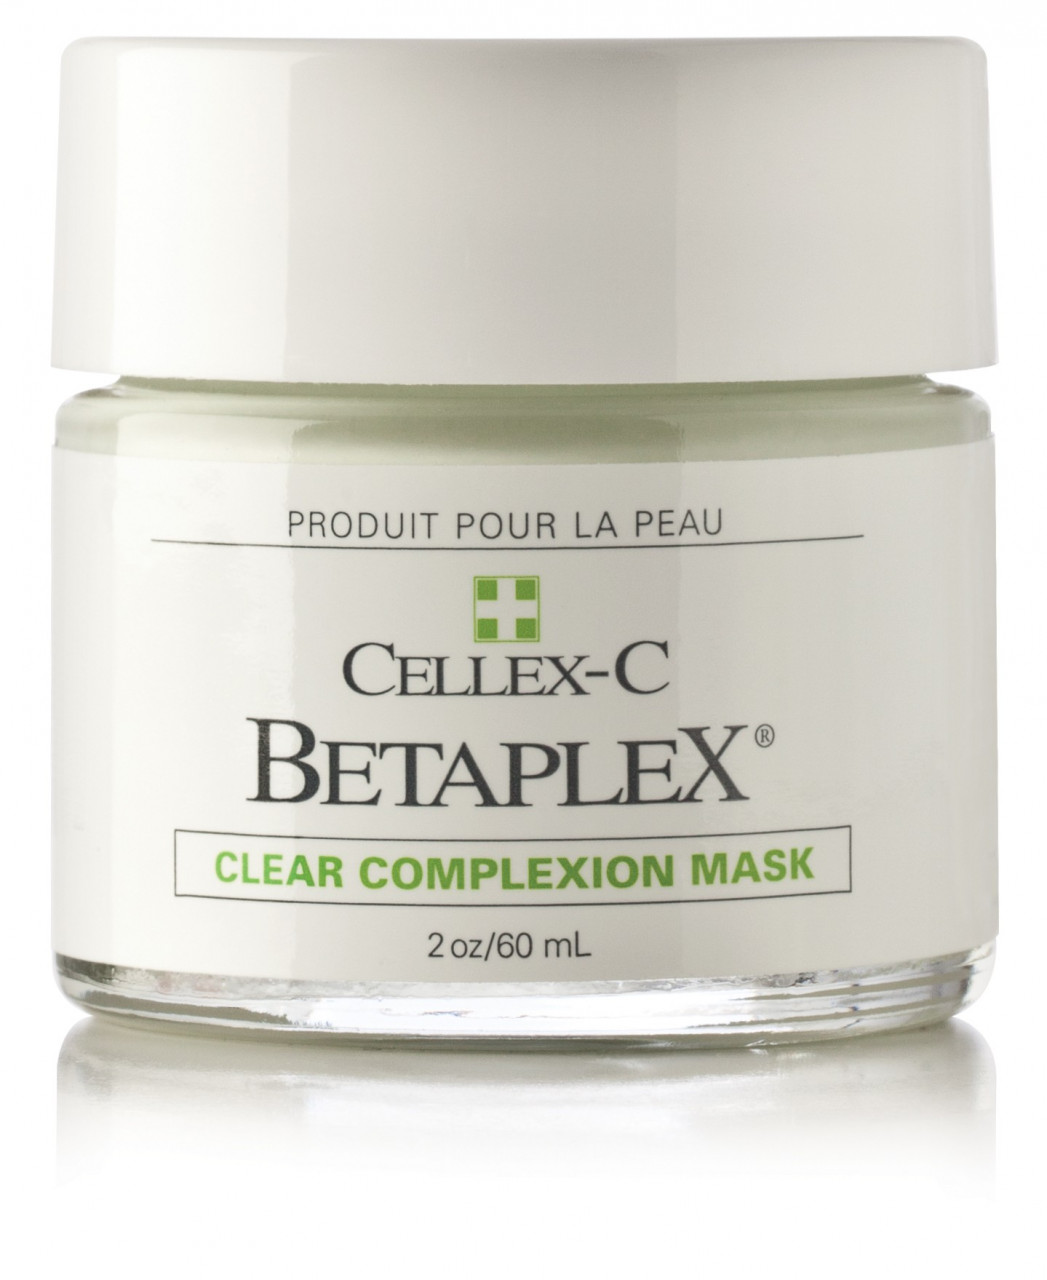 Betaplex Formulattions Clear Complexion Mask